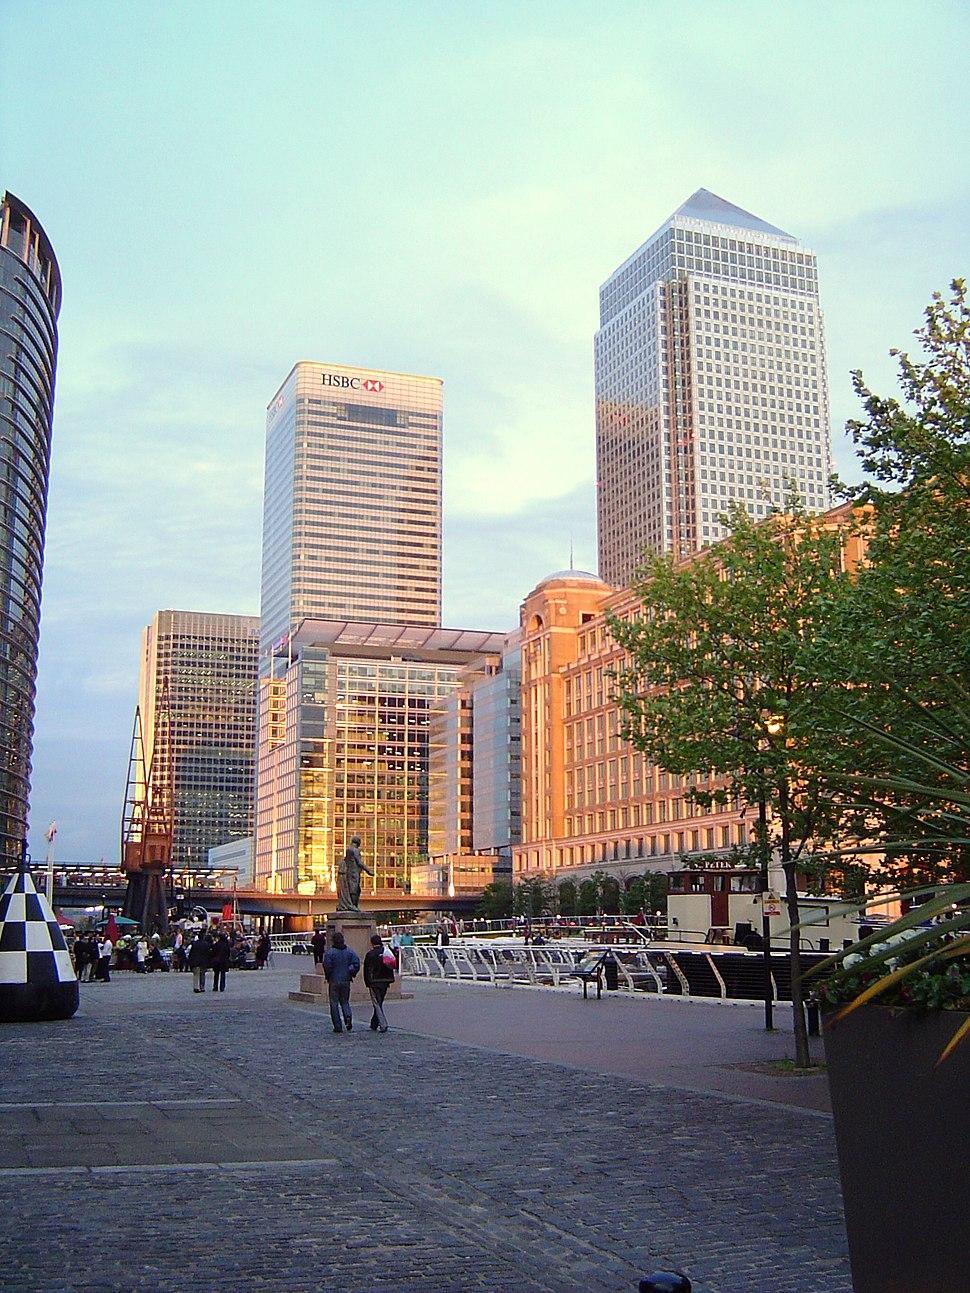 Canary Wharf HSBC